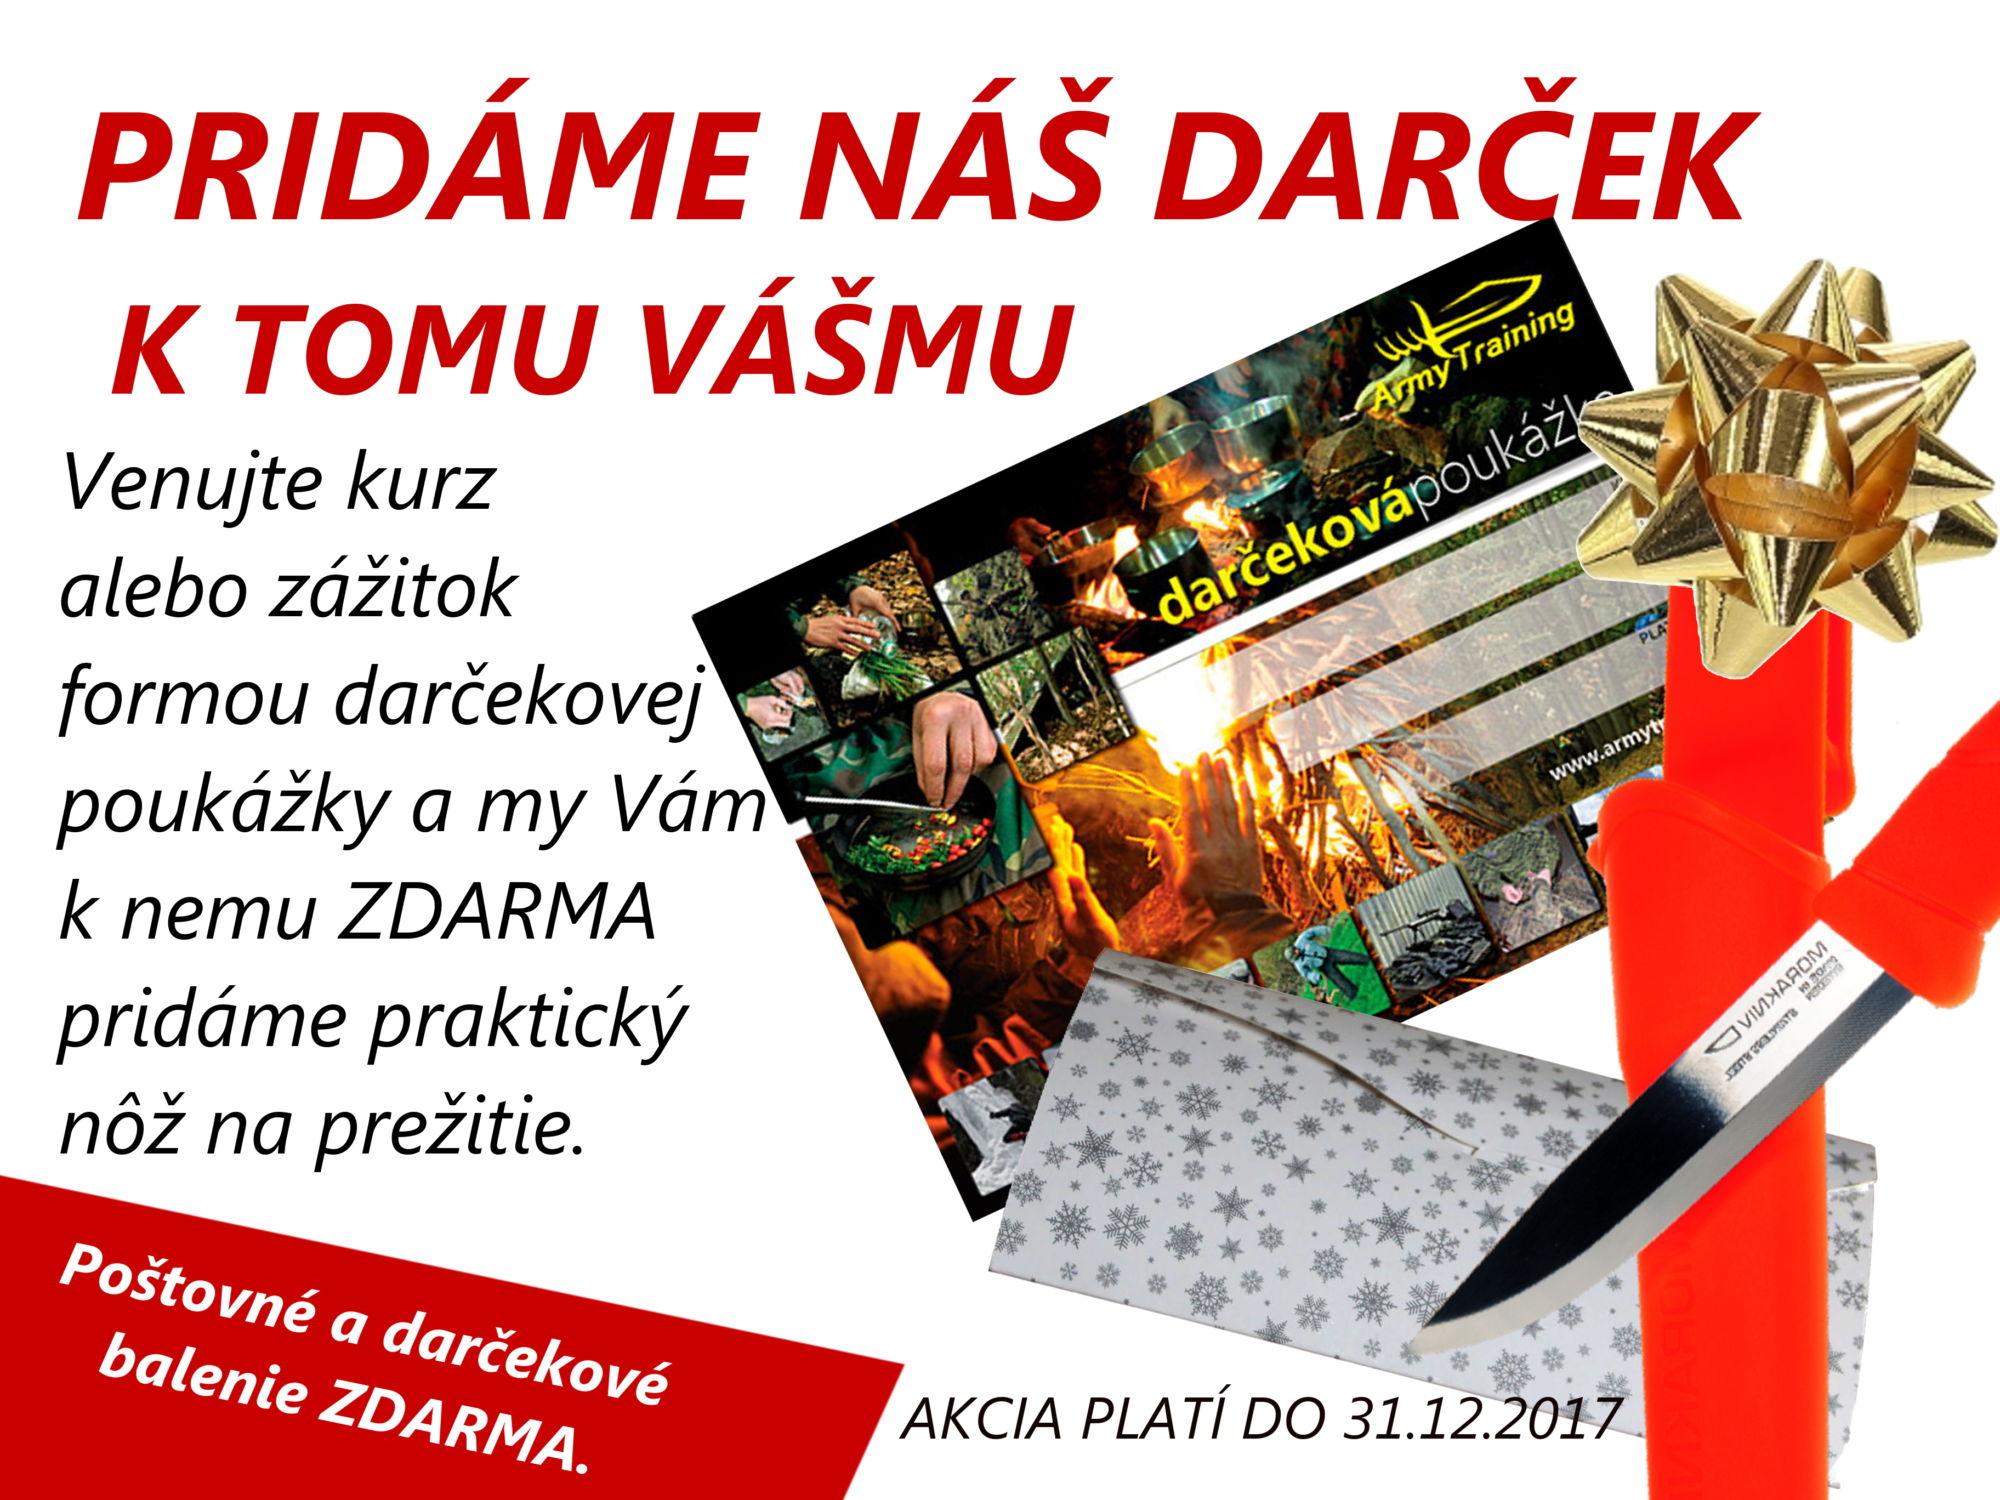 vianoce akcia 2017